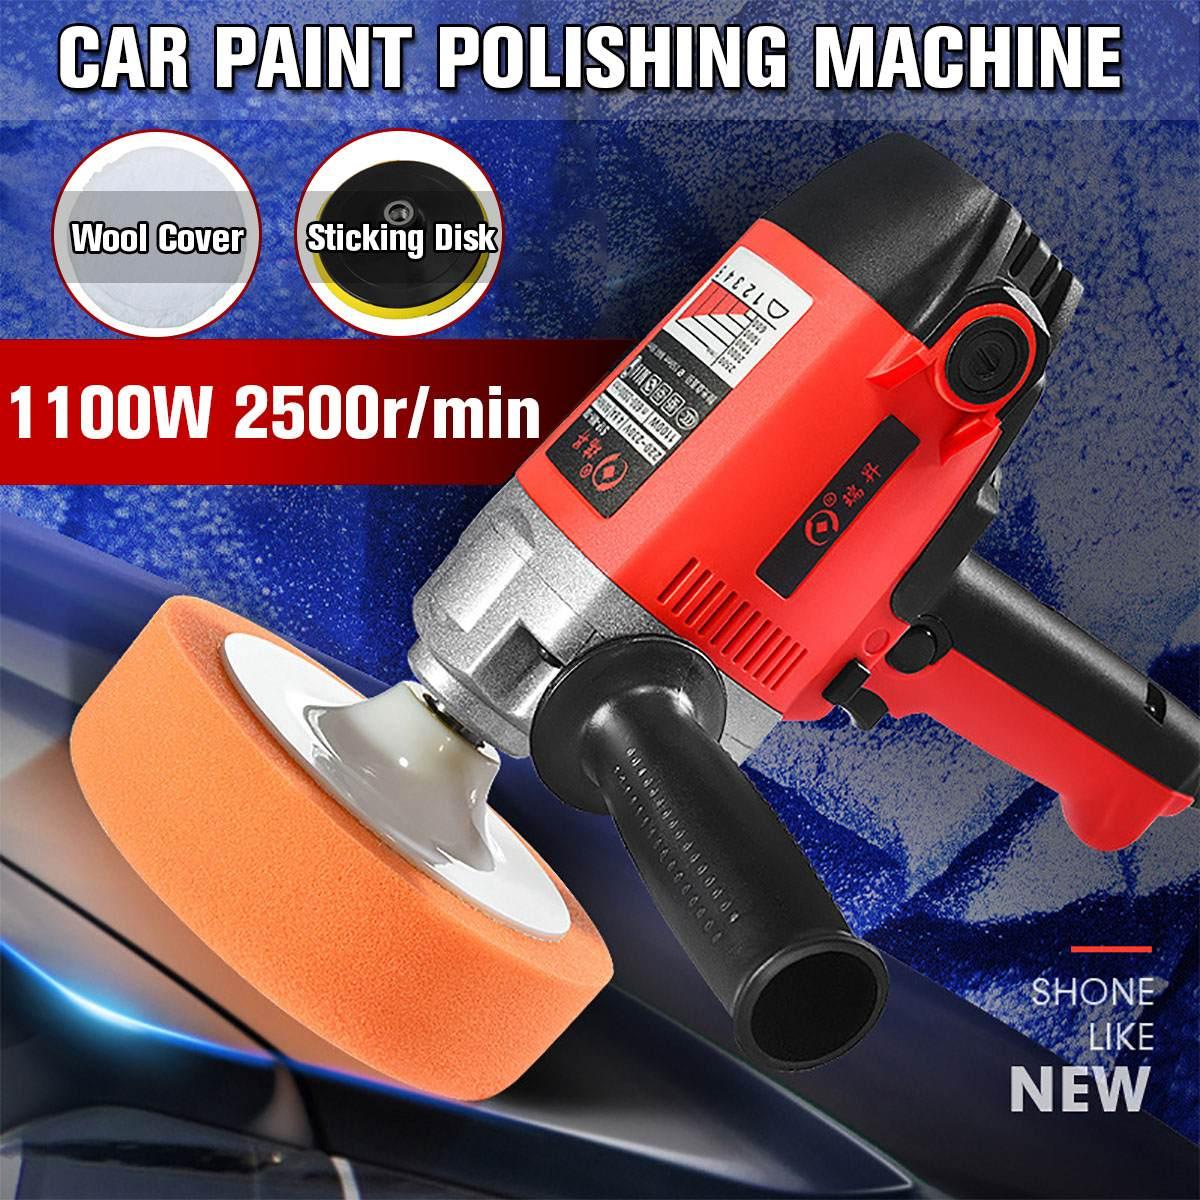 1100W 220V 5 Speed Car Vertical Polishing Machine Electric Car Polisher1100W 220V 5 Speed Car Vertical Polishing Machine Electric Car Polisher